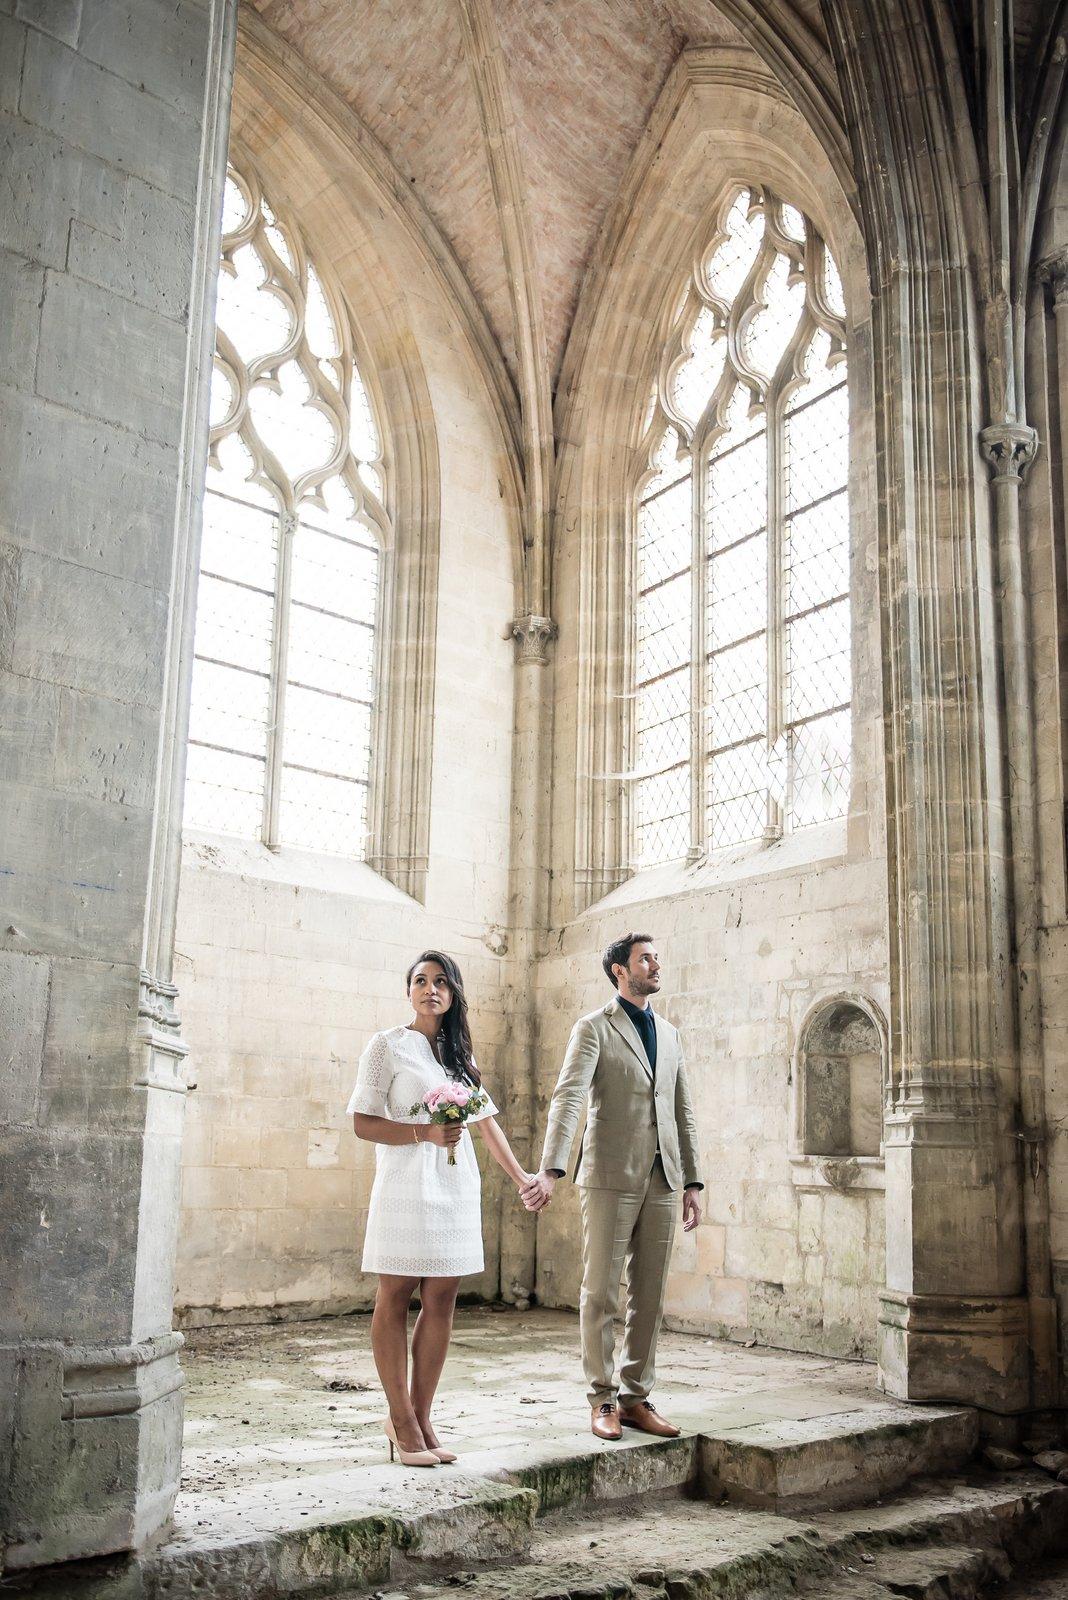 photographe Caen, Photographe Caen – séance engagement Alexandre & Victoria-Lynn